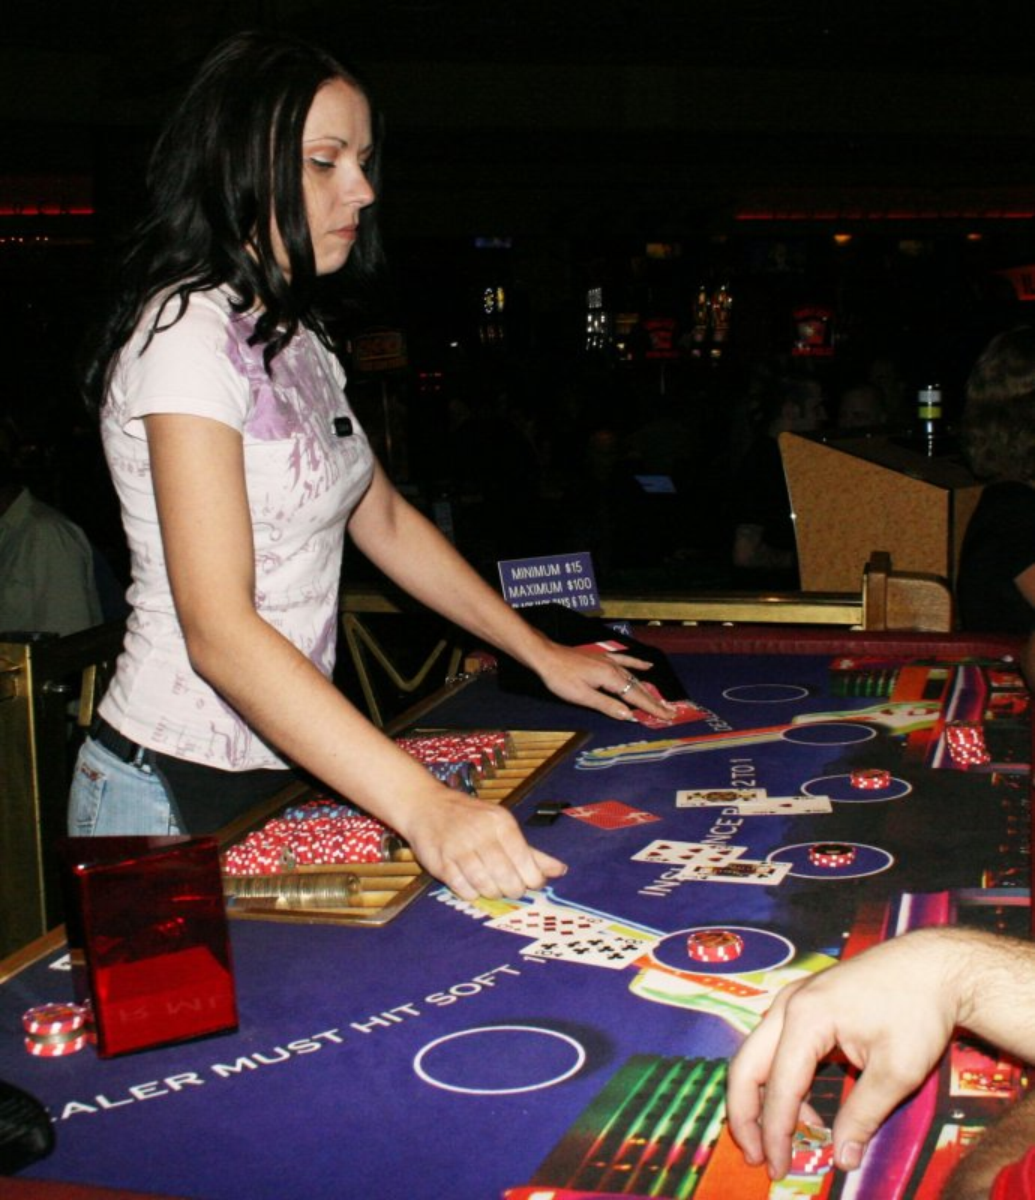 Casino niagara union casino illinois directory guide job